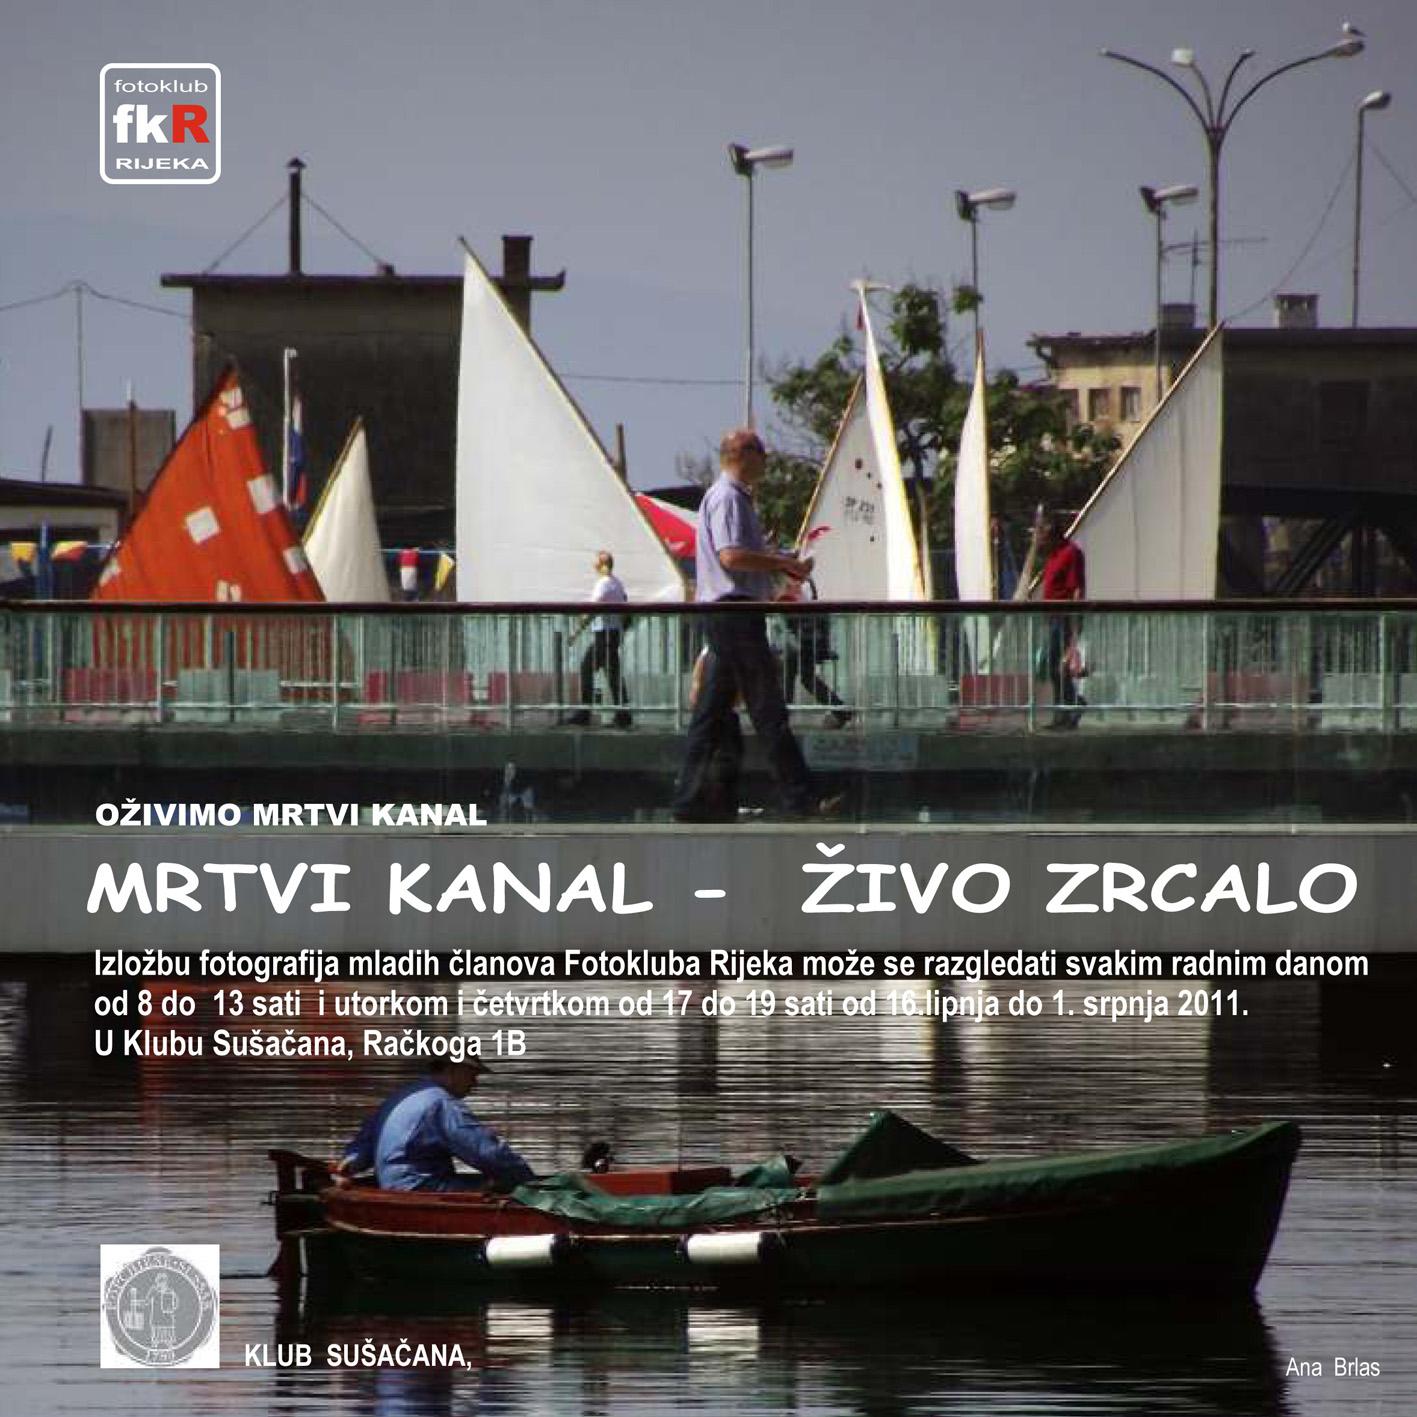 MRTVI KANAL - ZIVO ZRCALO -pozivnica